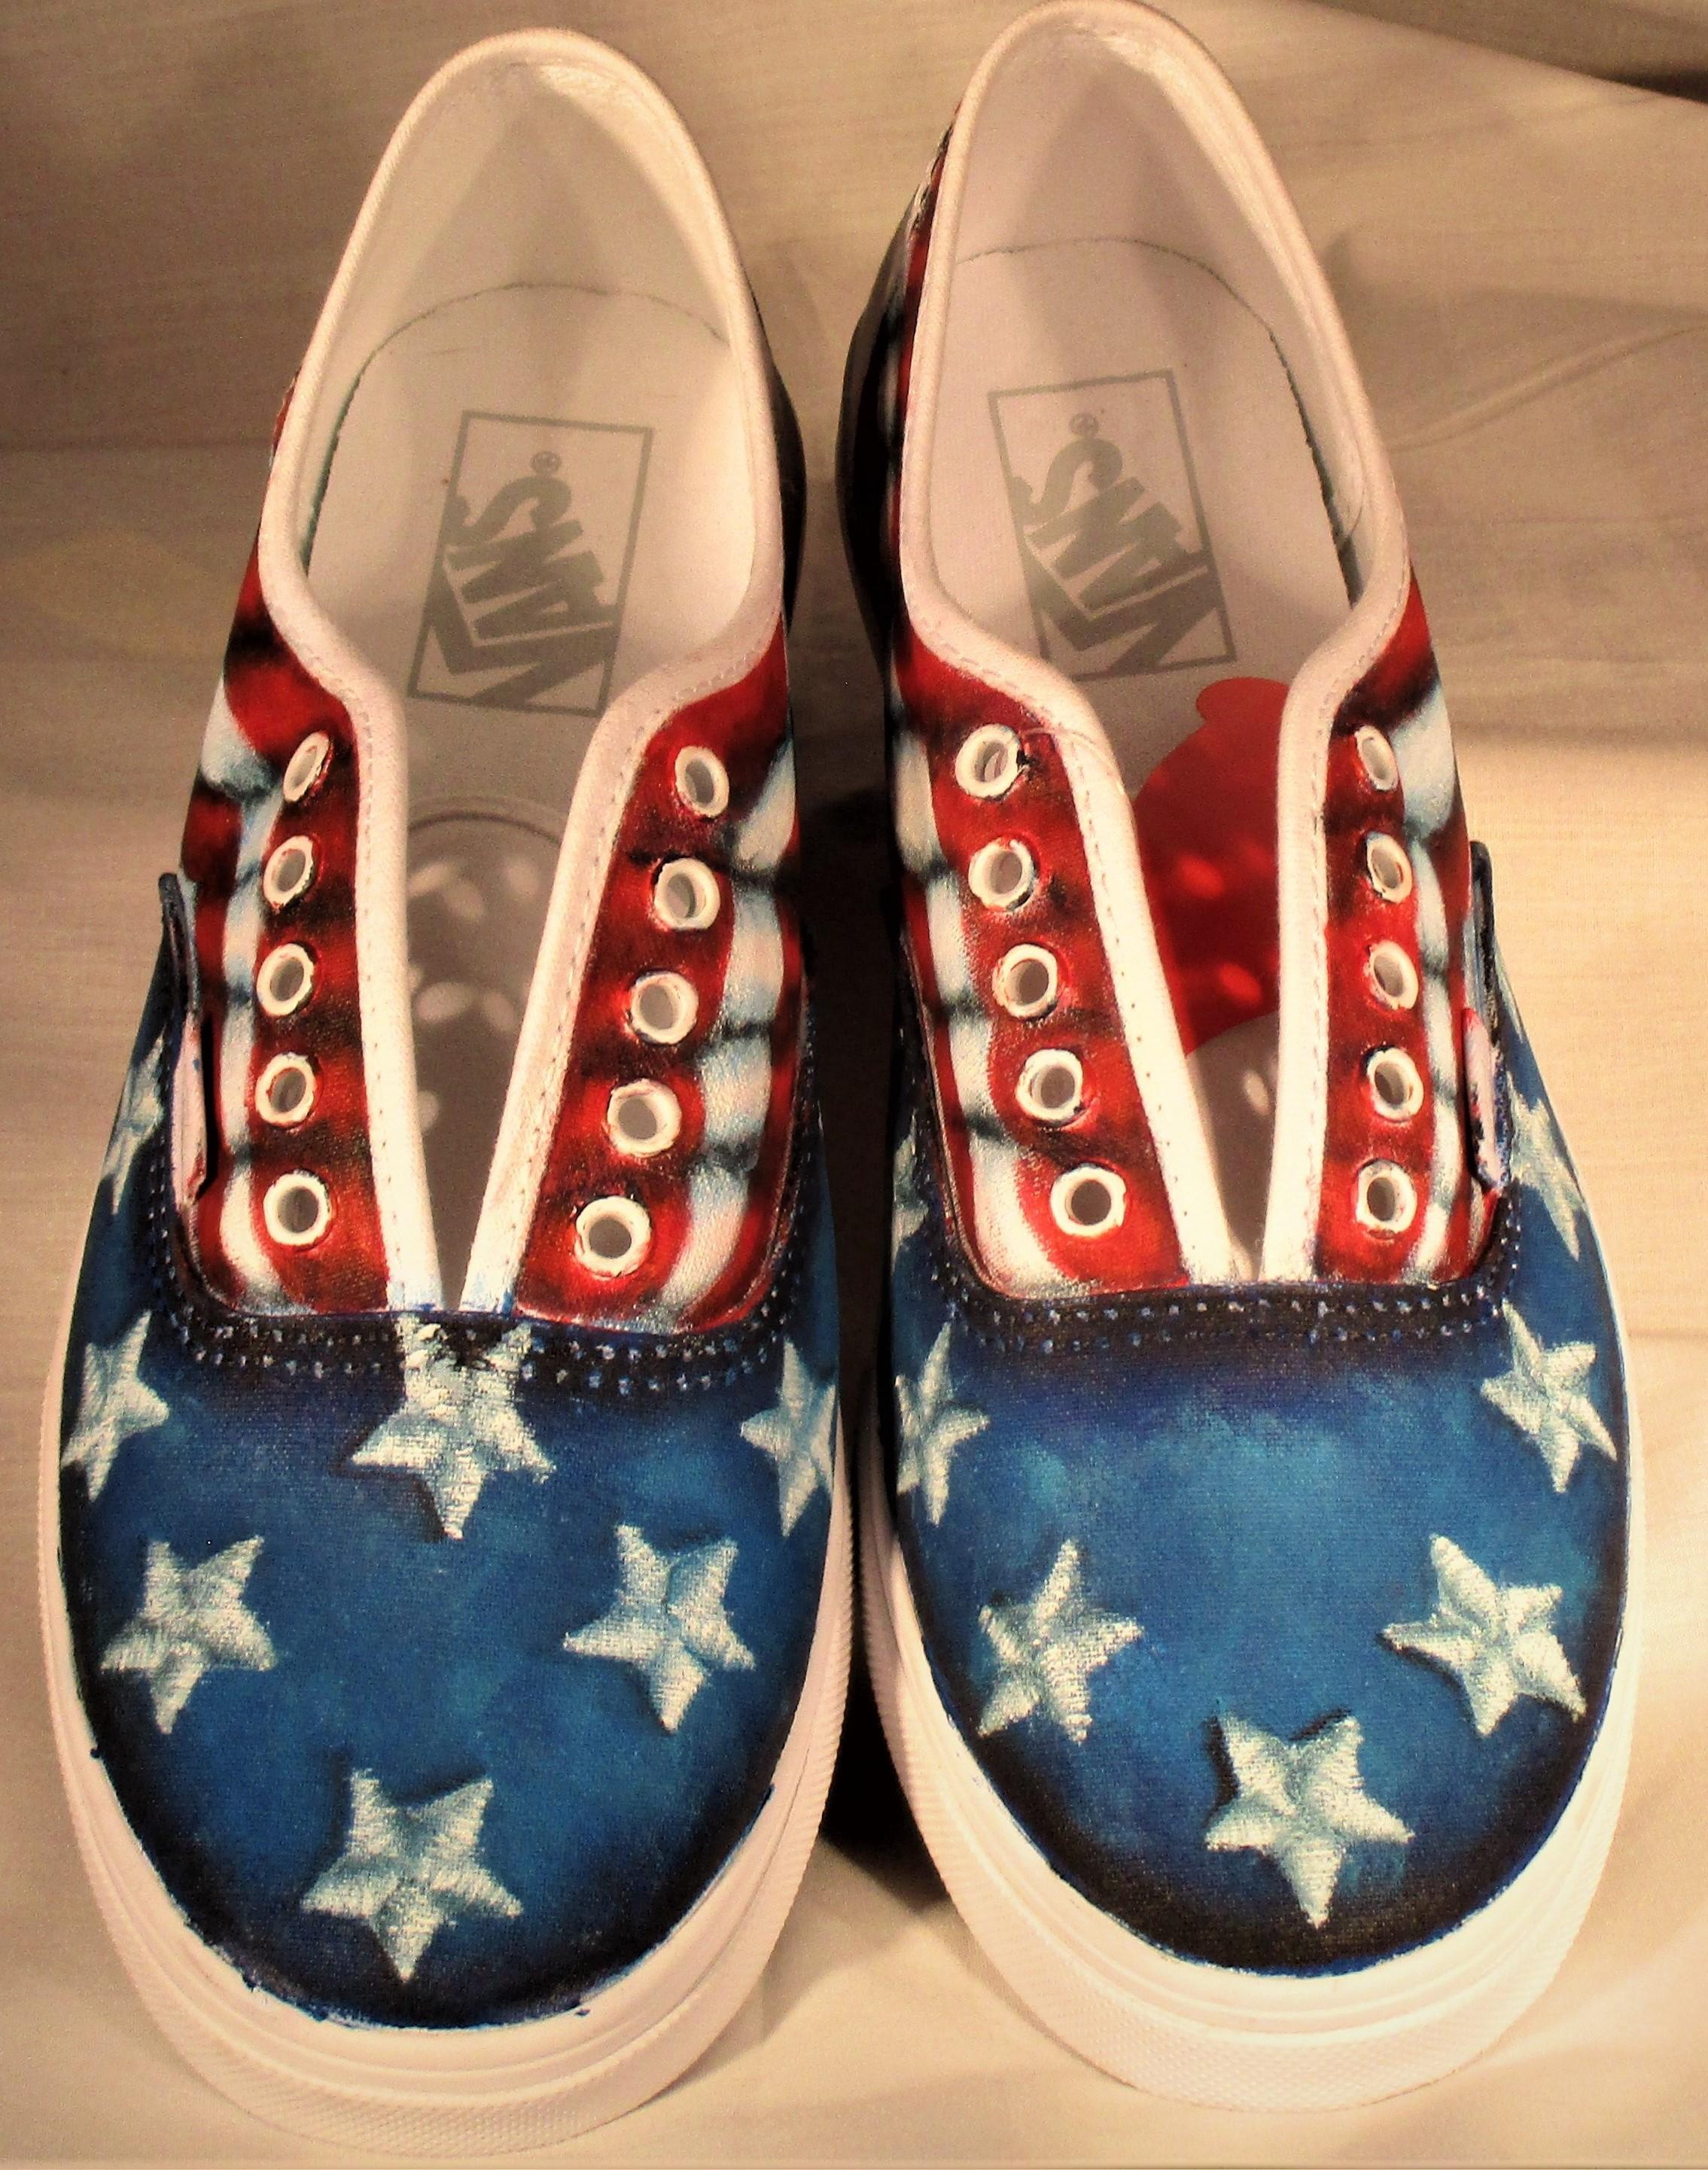 American Flag Shoes - E-Packet - Ann Perz